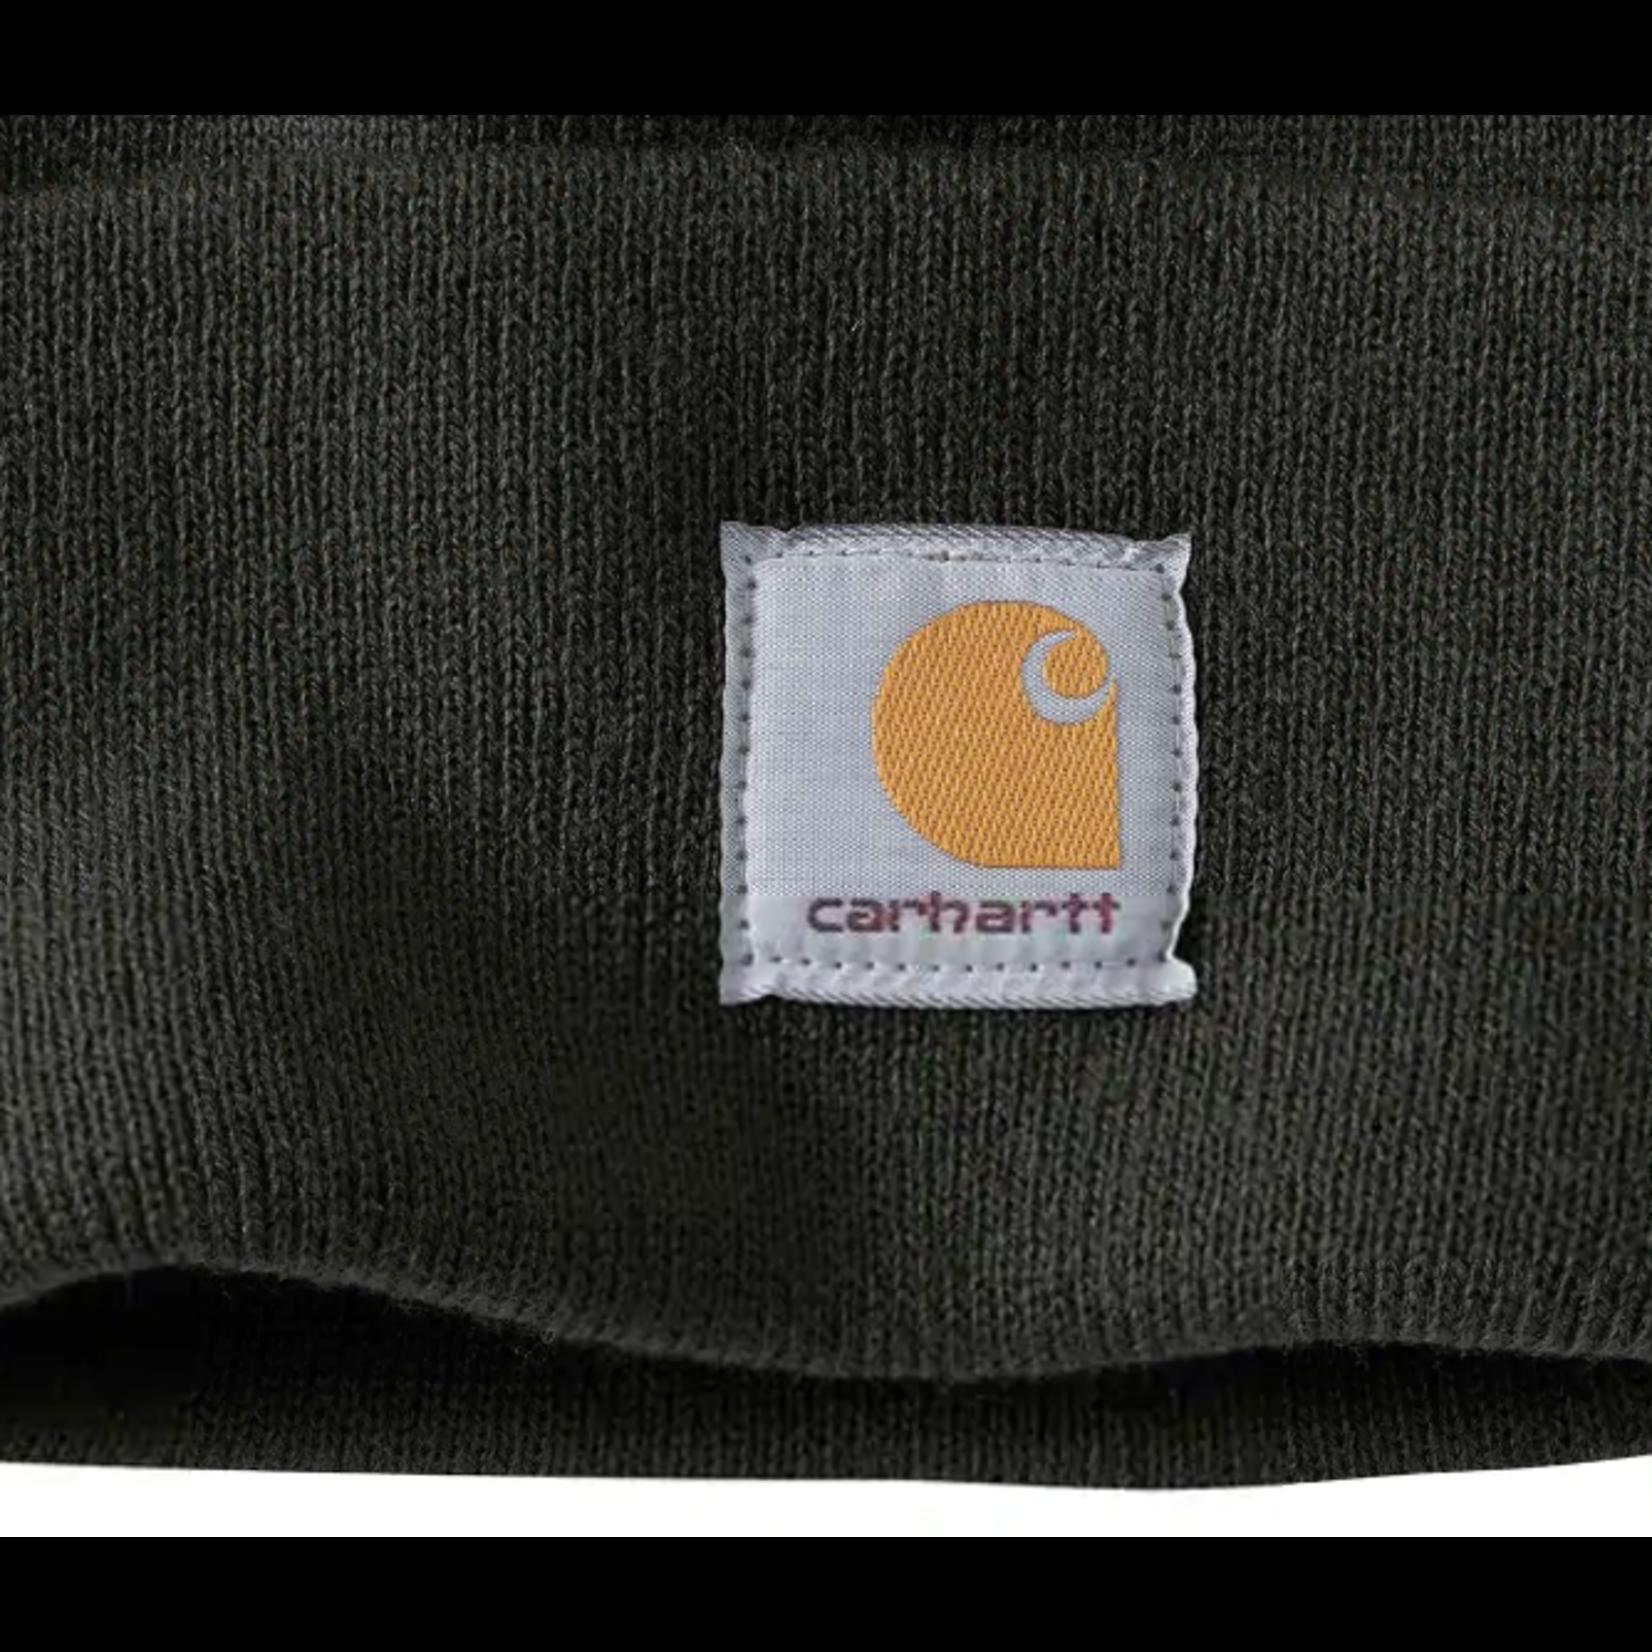 Carhartt Carhartt A18 Toque - Black